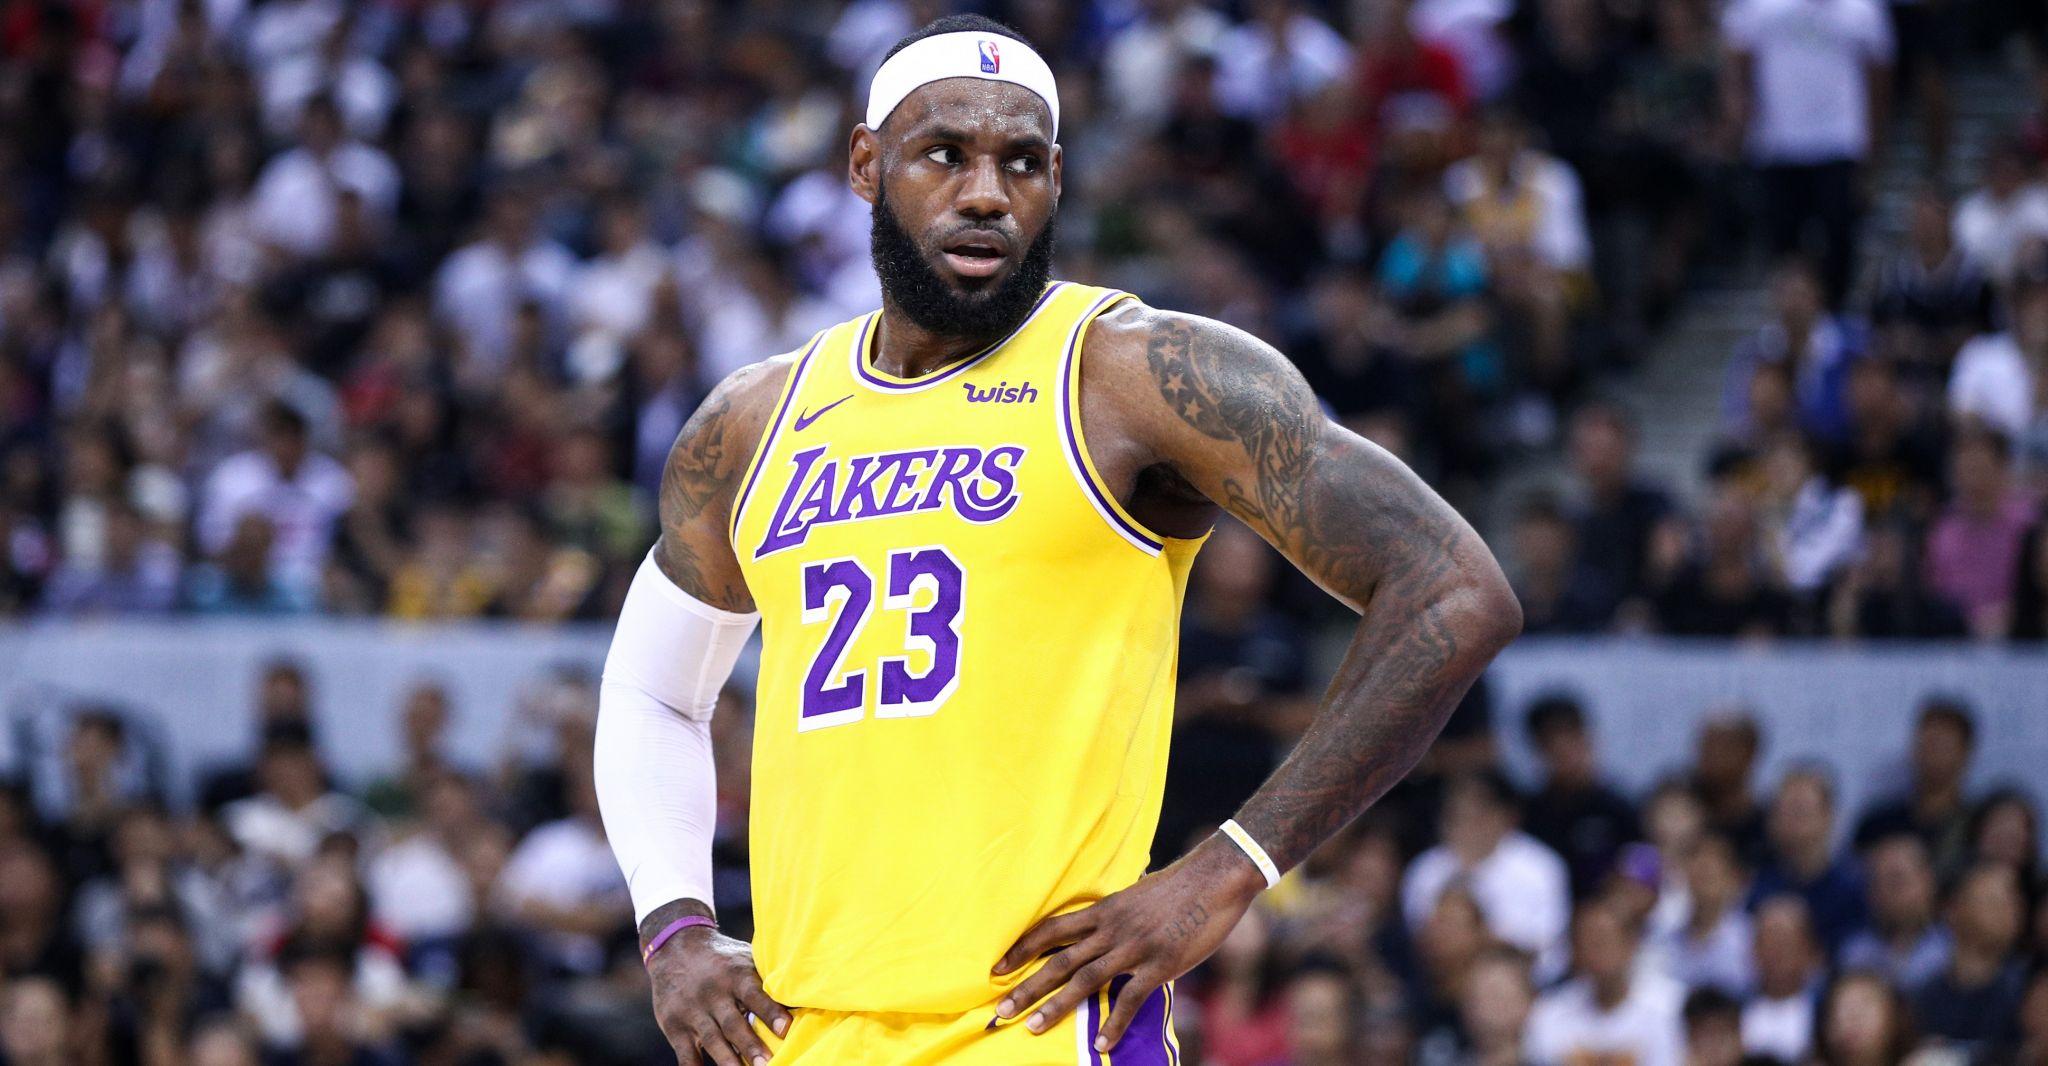 LeBron James: Rockets GM Daryl Morey 'wasn't educated' on China tweet